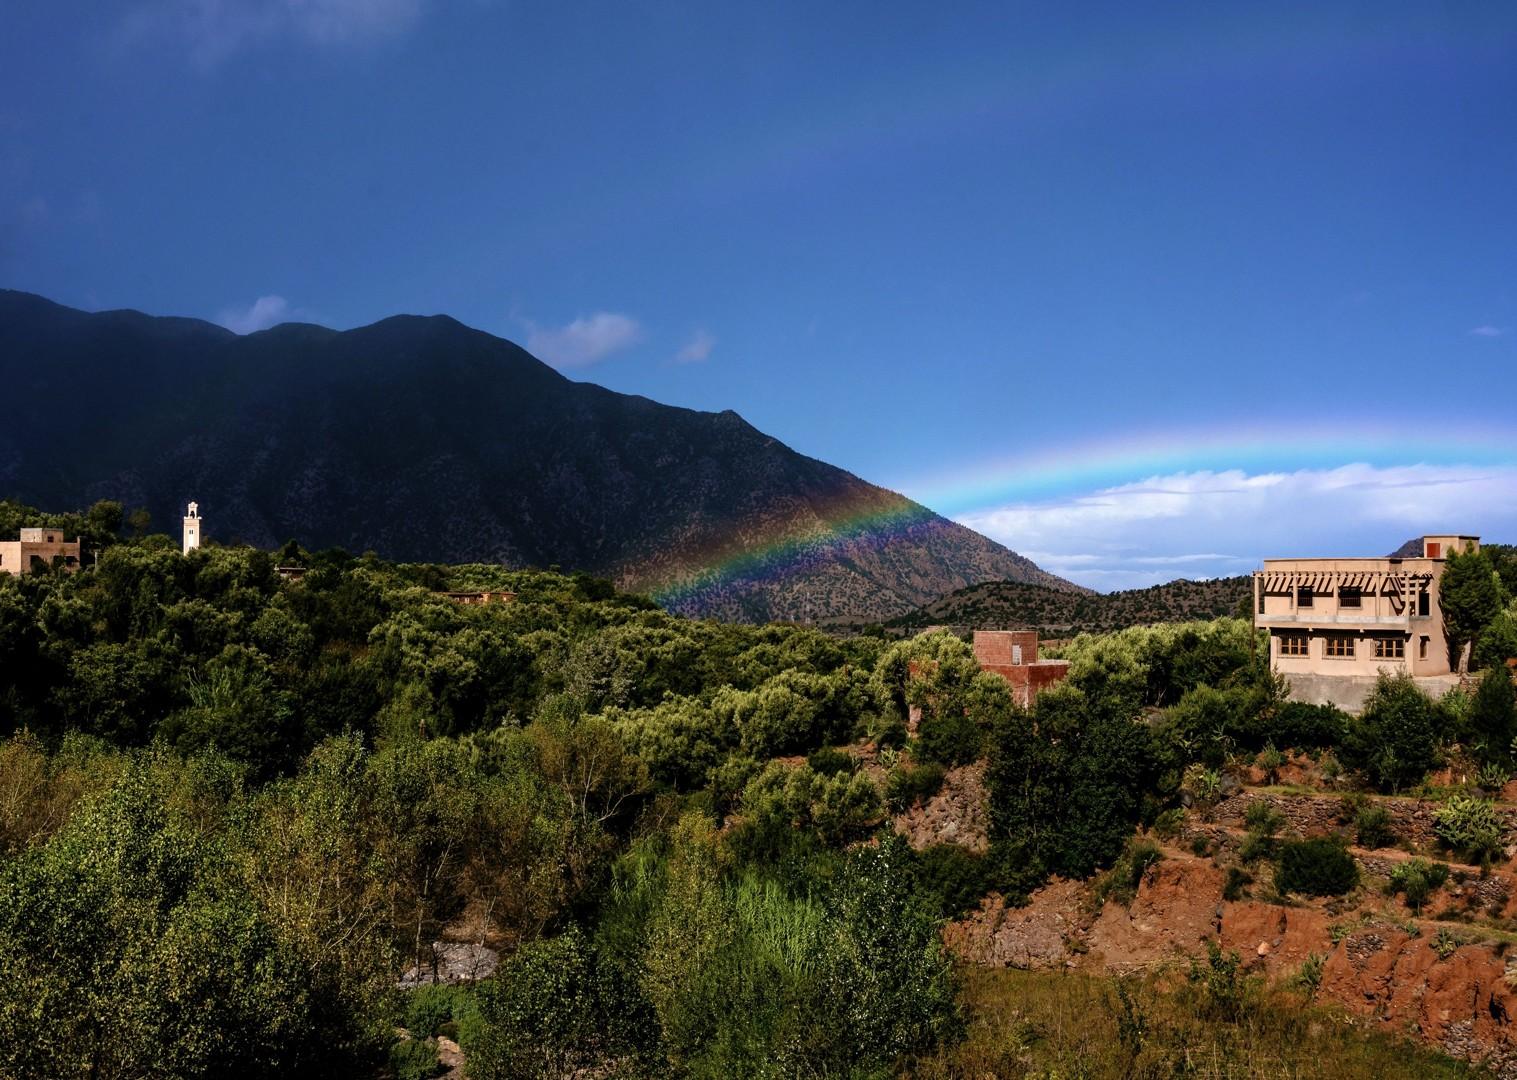 mountainbiking-mountains-landscape.jpg - Morocco - Atlas to Desert - Guided Mountain Bike Holiday - Mountain Biking